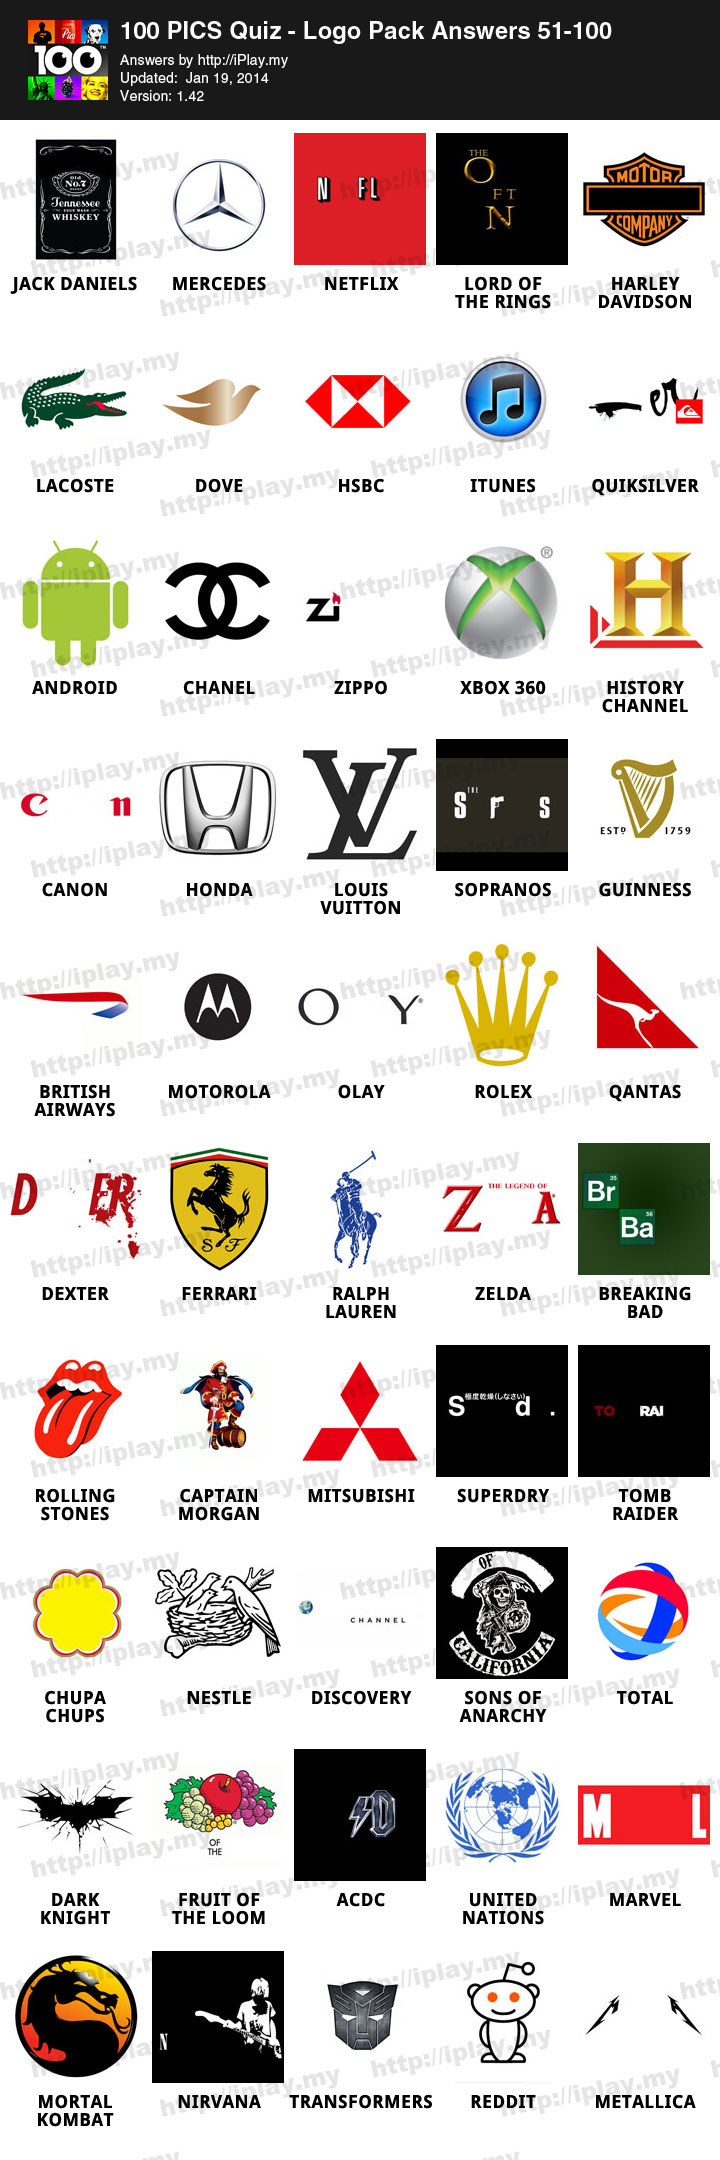 100 Pics Quiz Logo Pack Answers Iplay